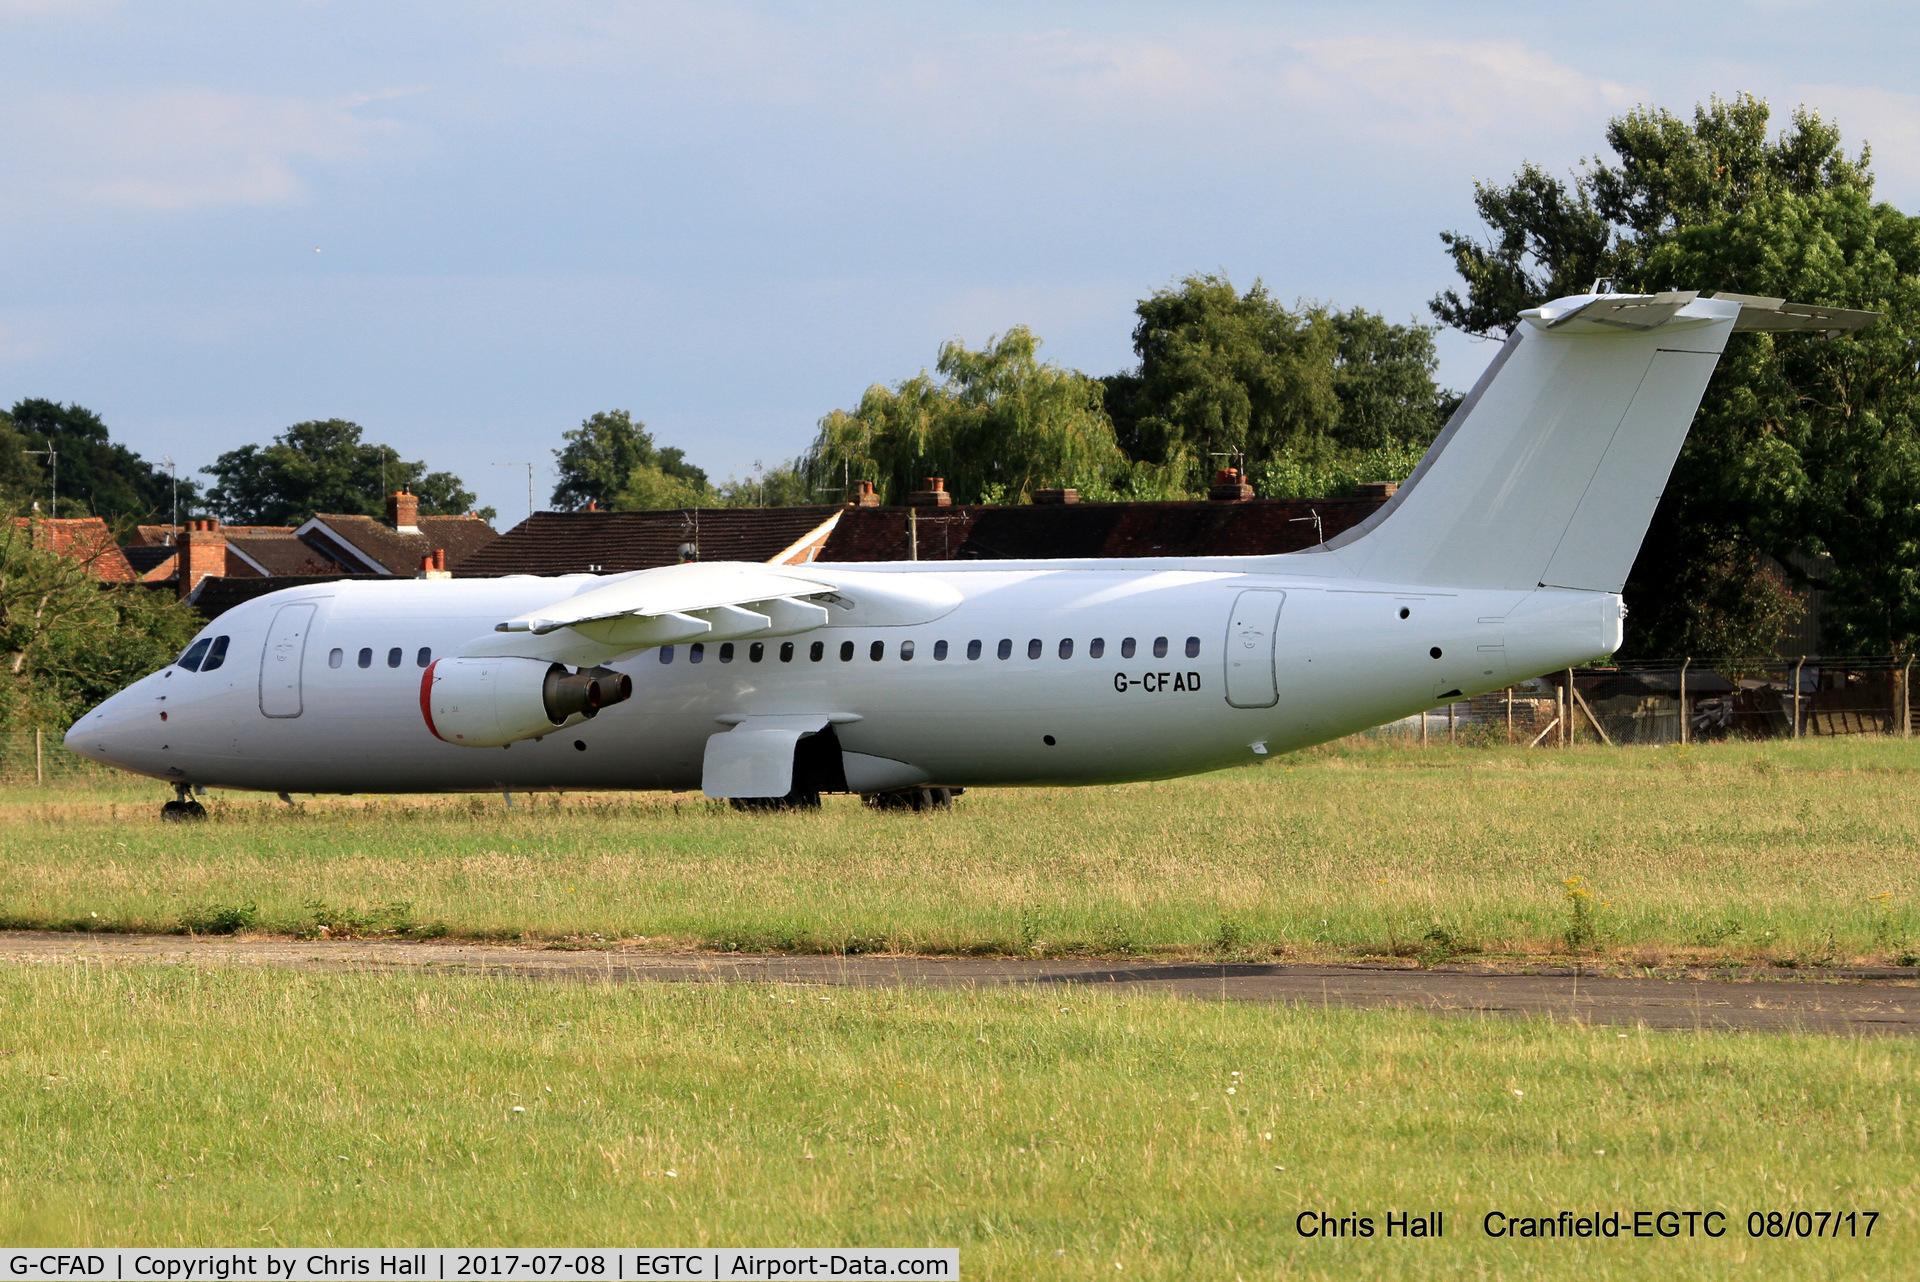 G-CFAD, 2000 British Aerospace Avro 146-RJ100 C/N E3380, stored at Cranfield